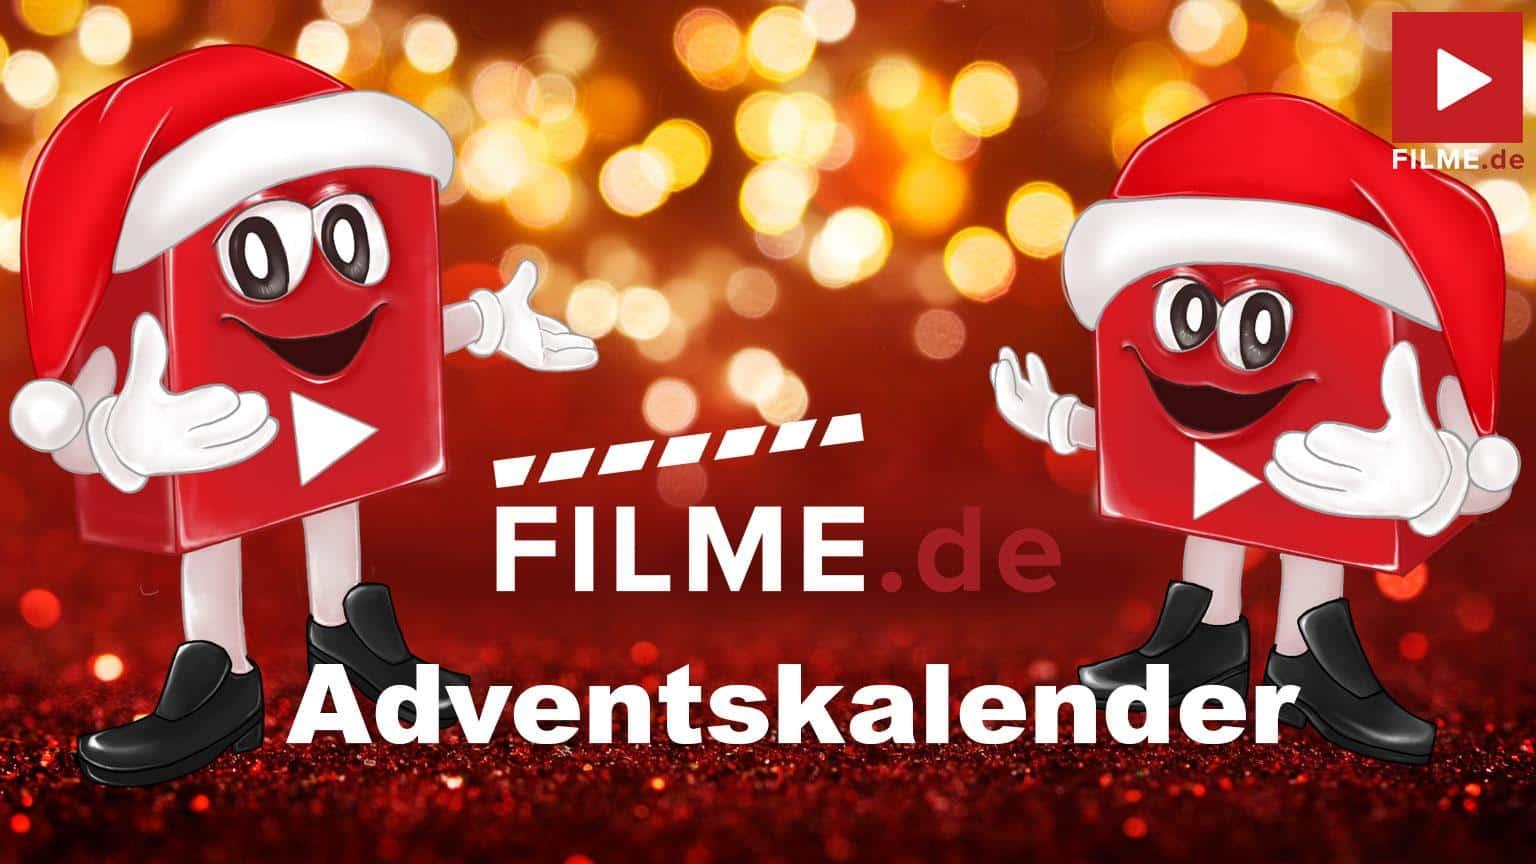 Adventskalender Filme.de 2019 Anzeige